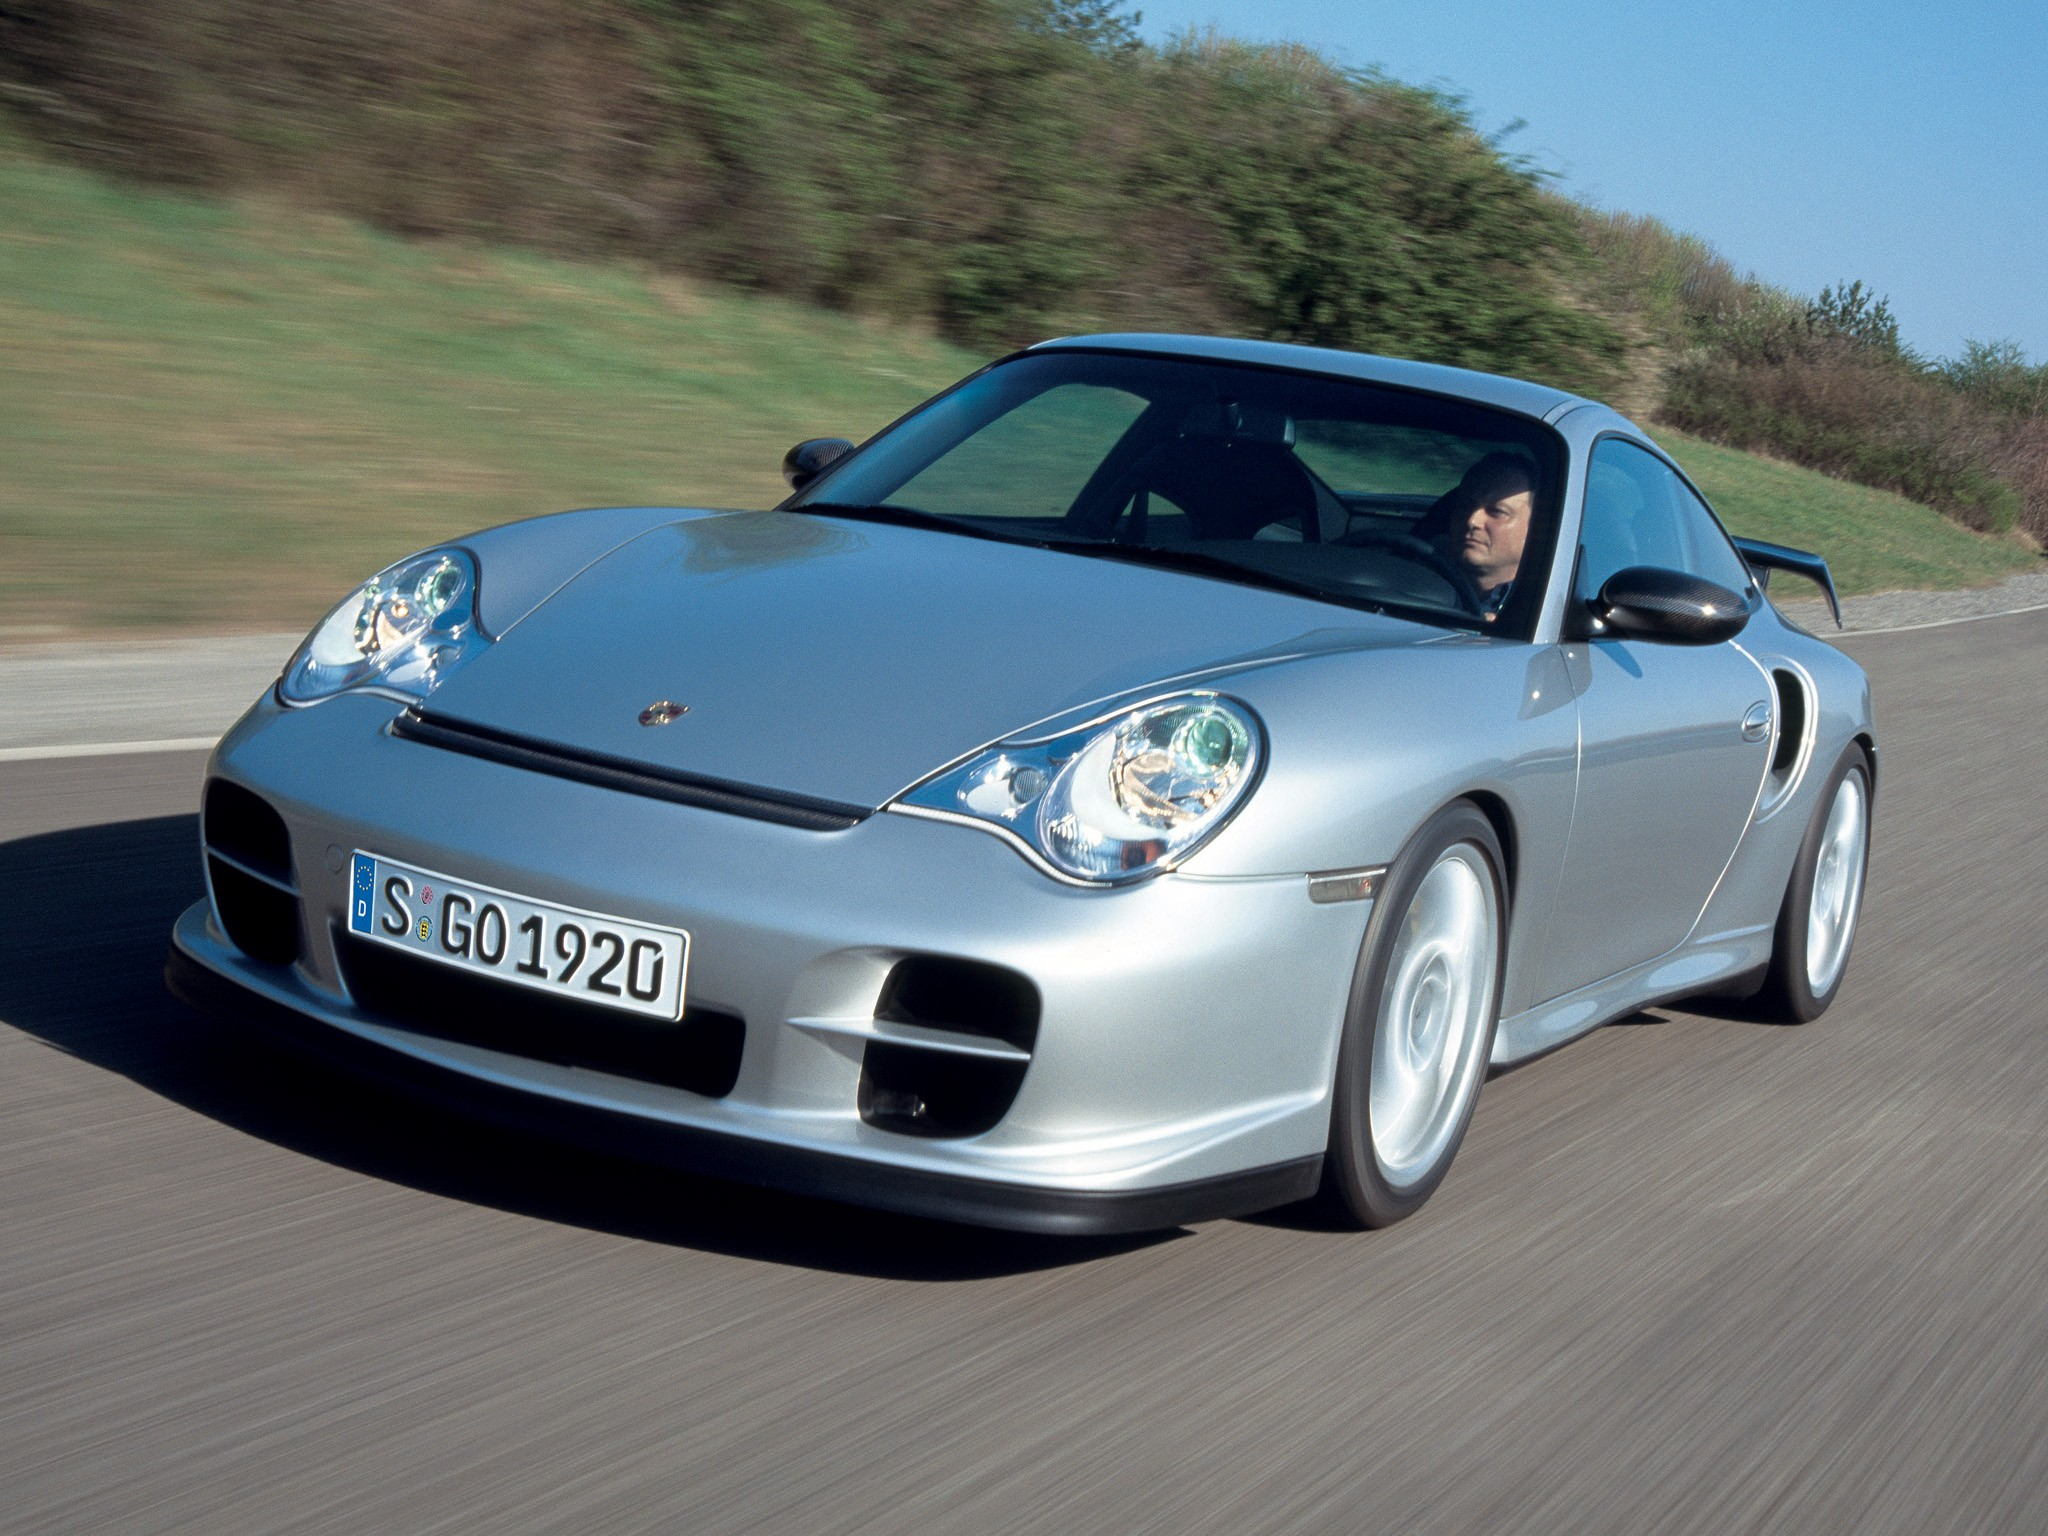 porsche 911 gt2 996 specs 2001 2002 2003 2004 2005 2006 autoevolution. Black Bedroom Furniture Sets. Home Design Ideas